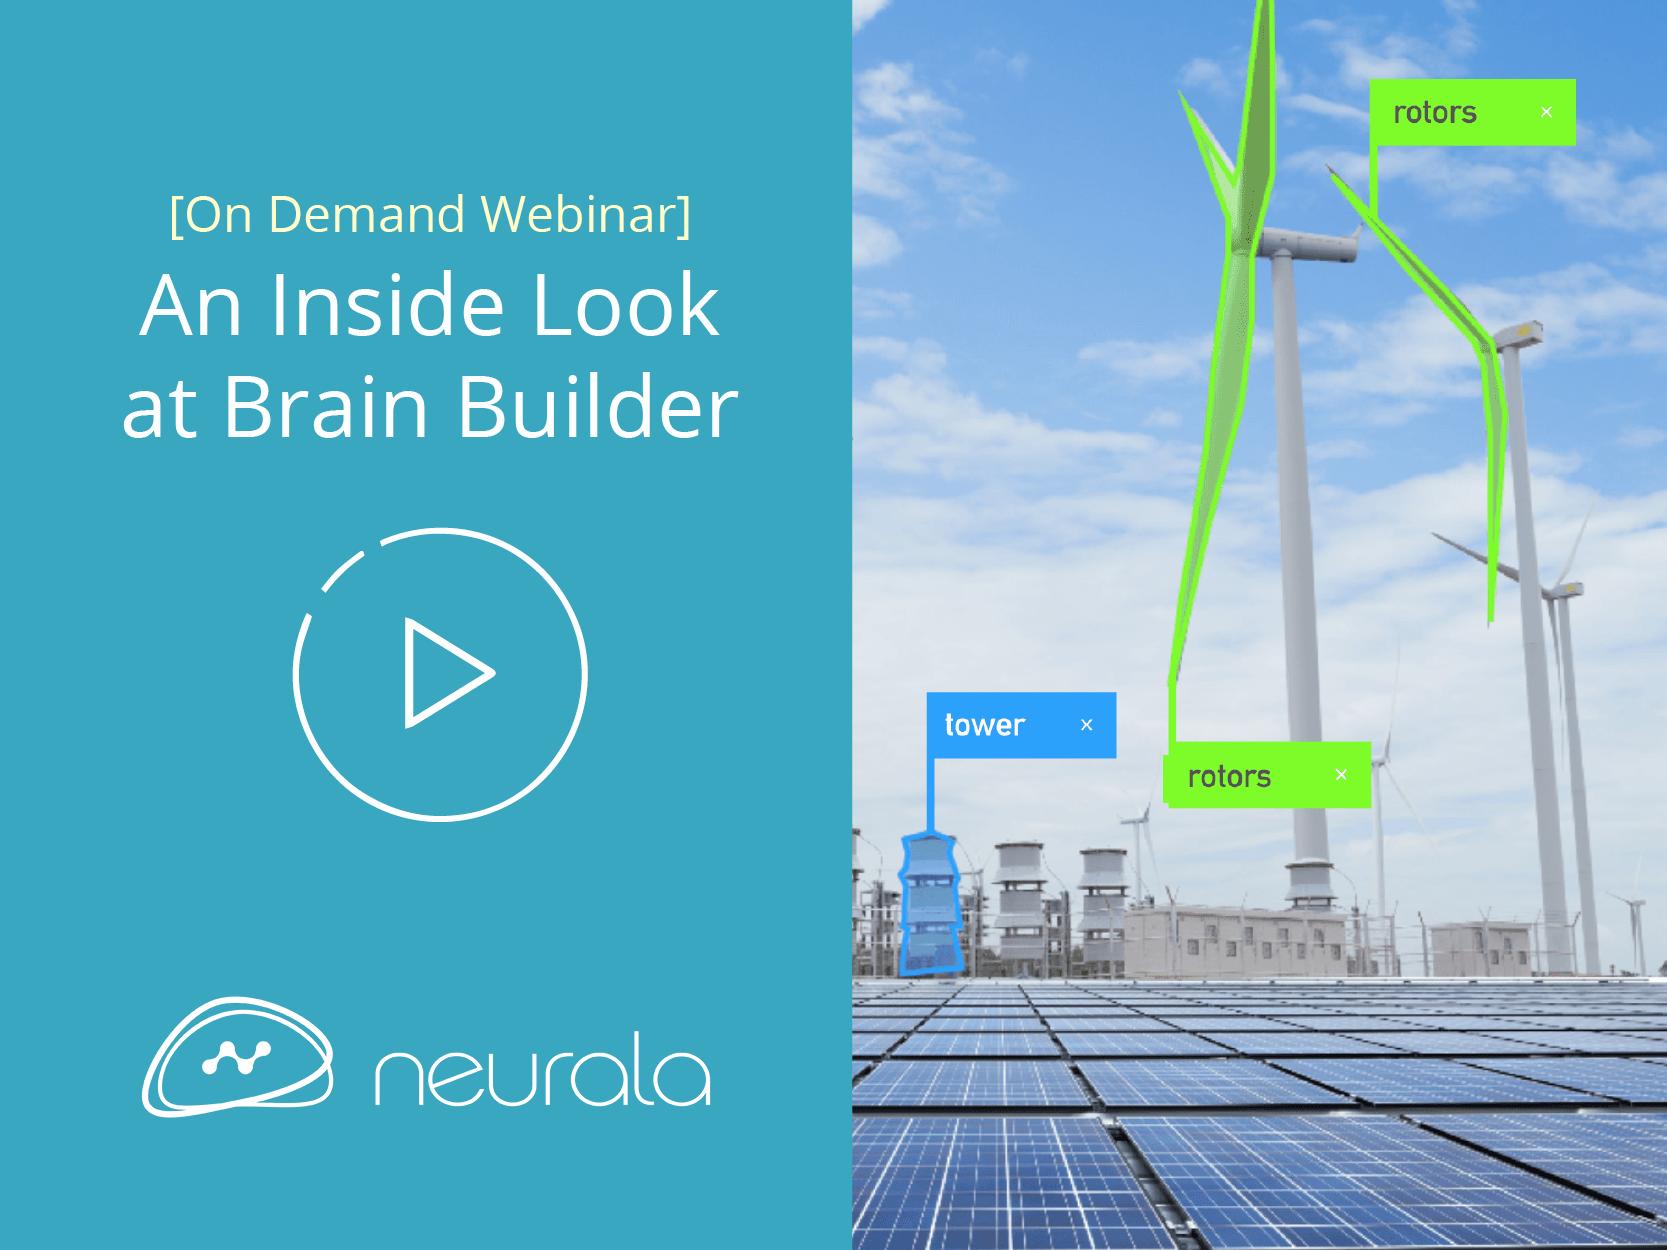 An Insider Look at Brain Builder